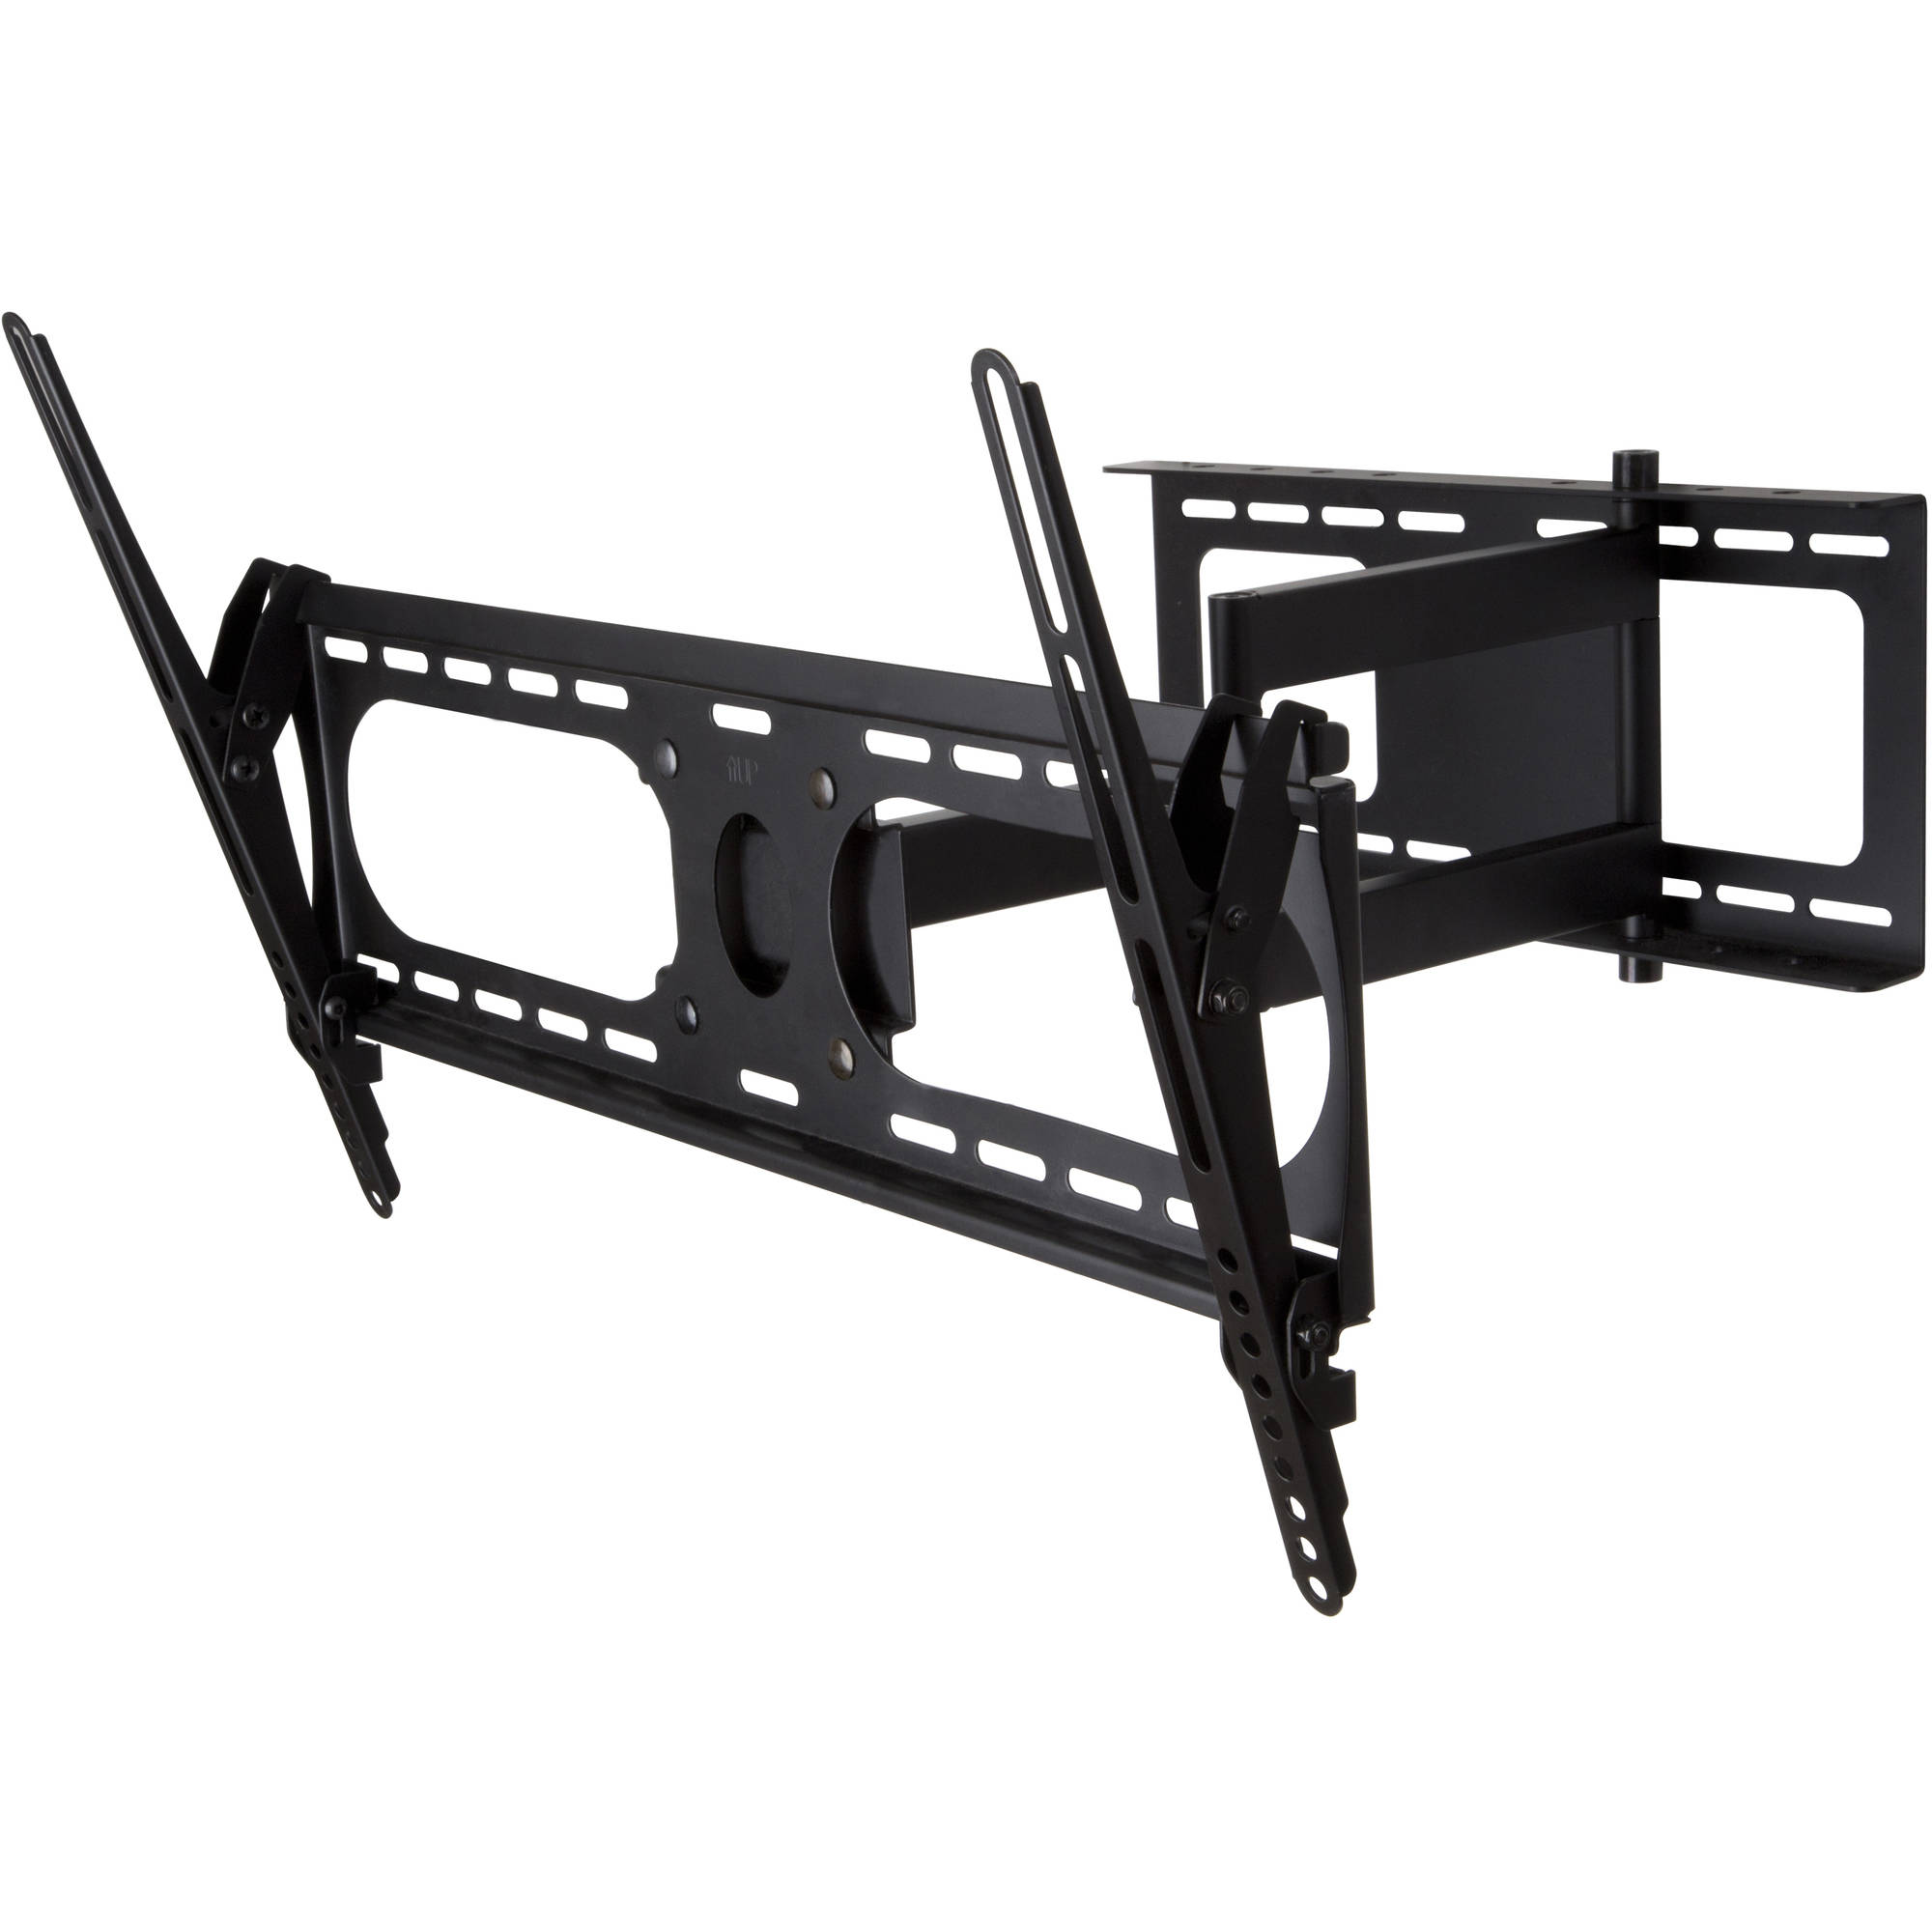 "Swift Mount SWIFT650-AP Full Motion Wall Mount for Flat Panel TV's 37""-65"""